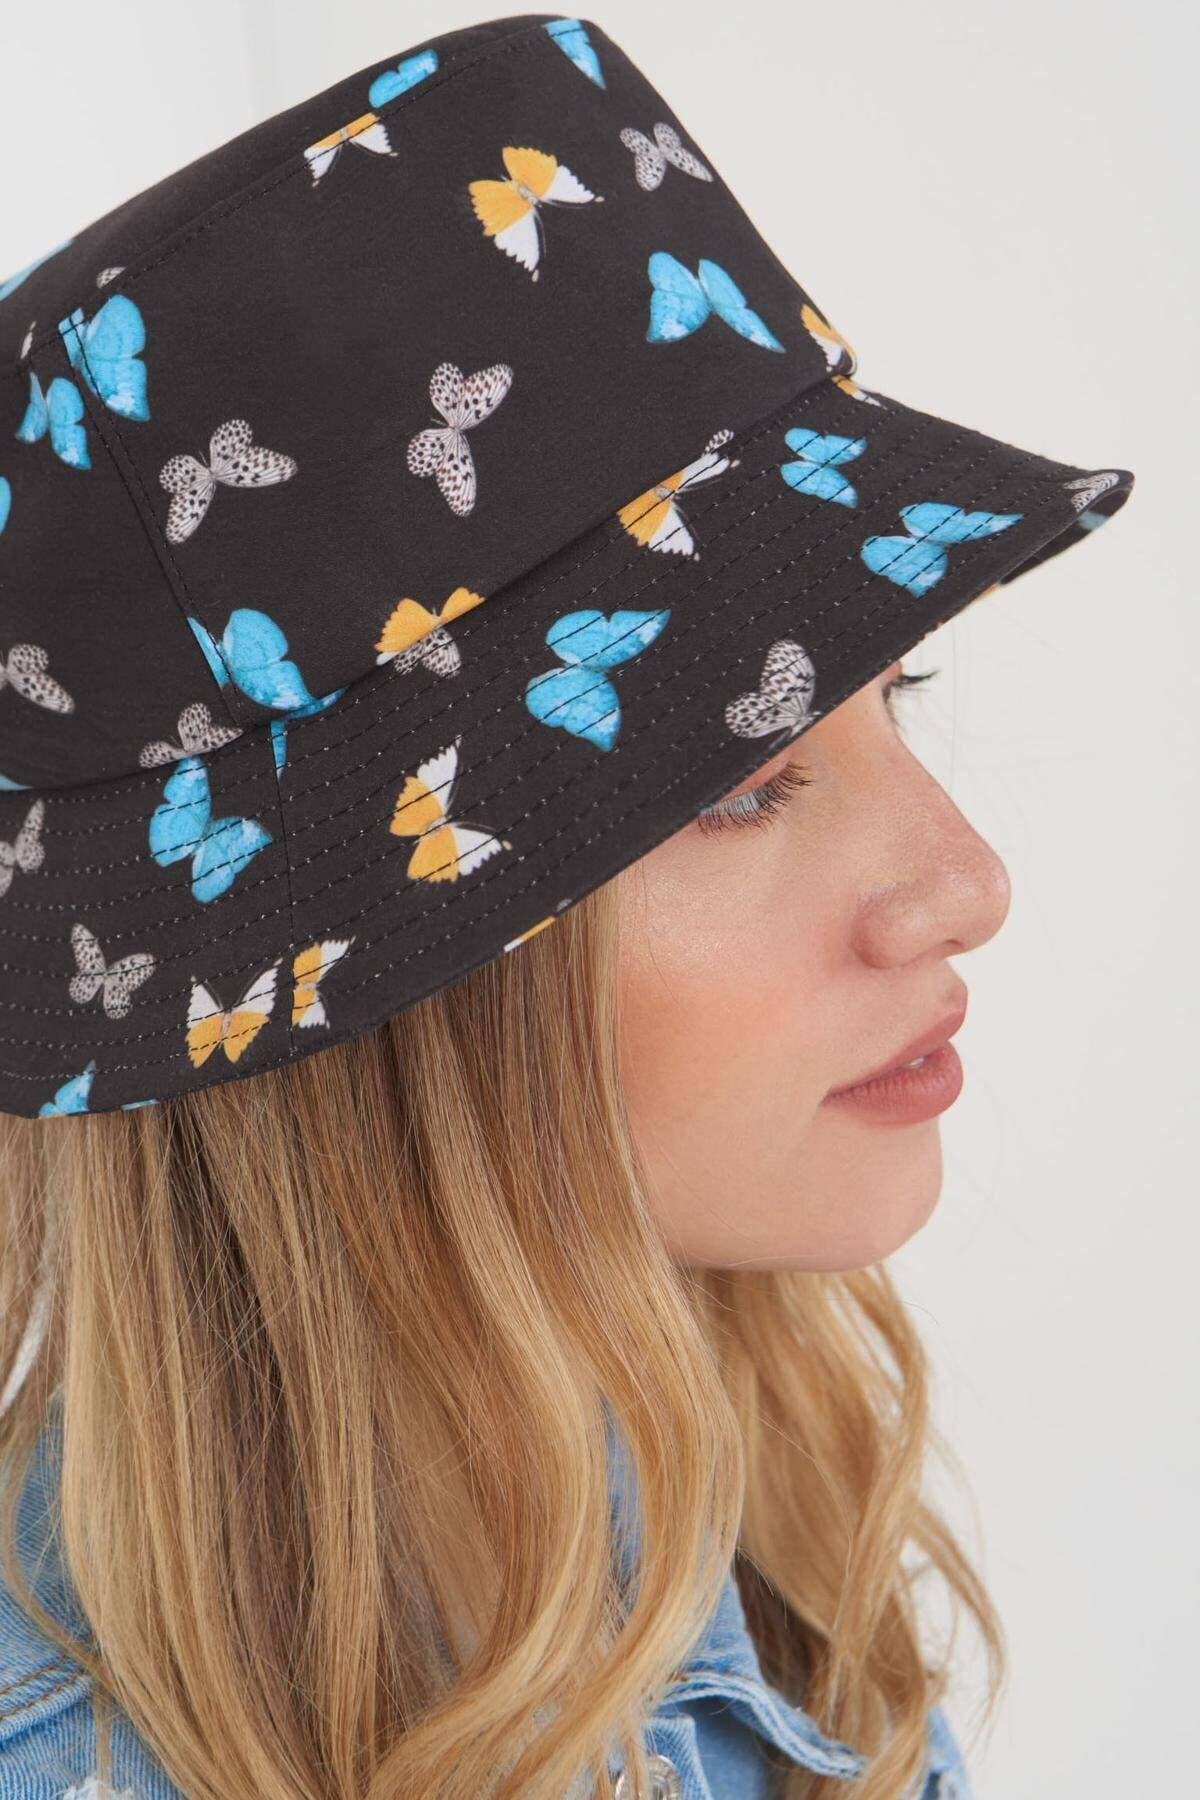 Addax Kadın Siyah Mavi Şapka Şpk1045 - E1 Adx-0000023856 3